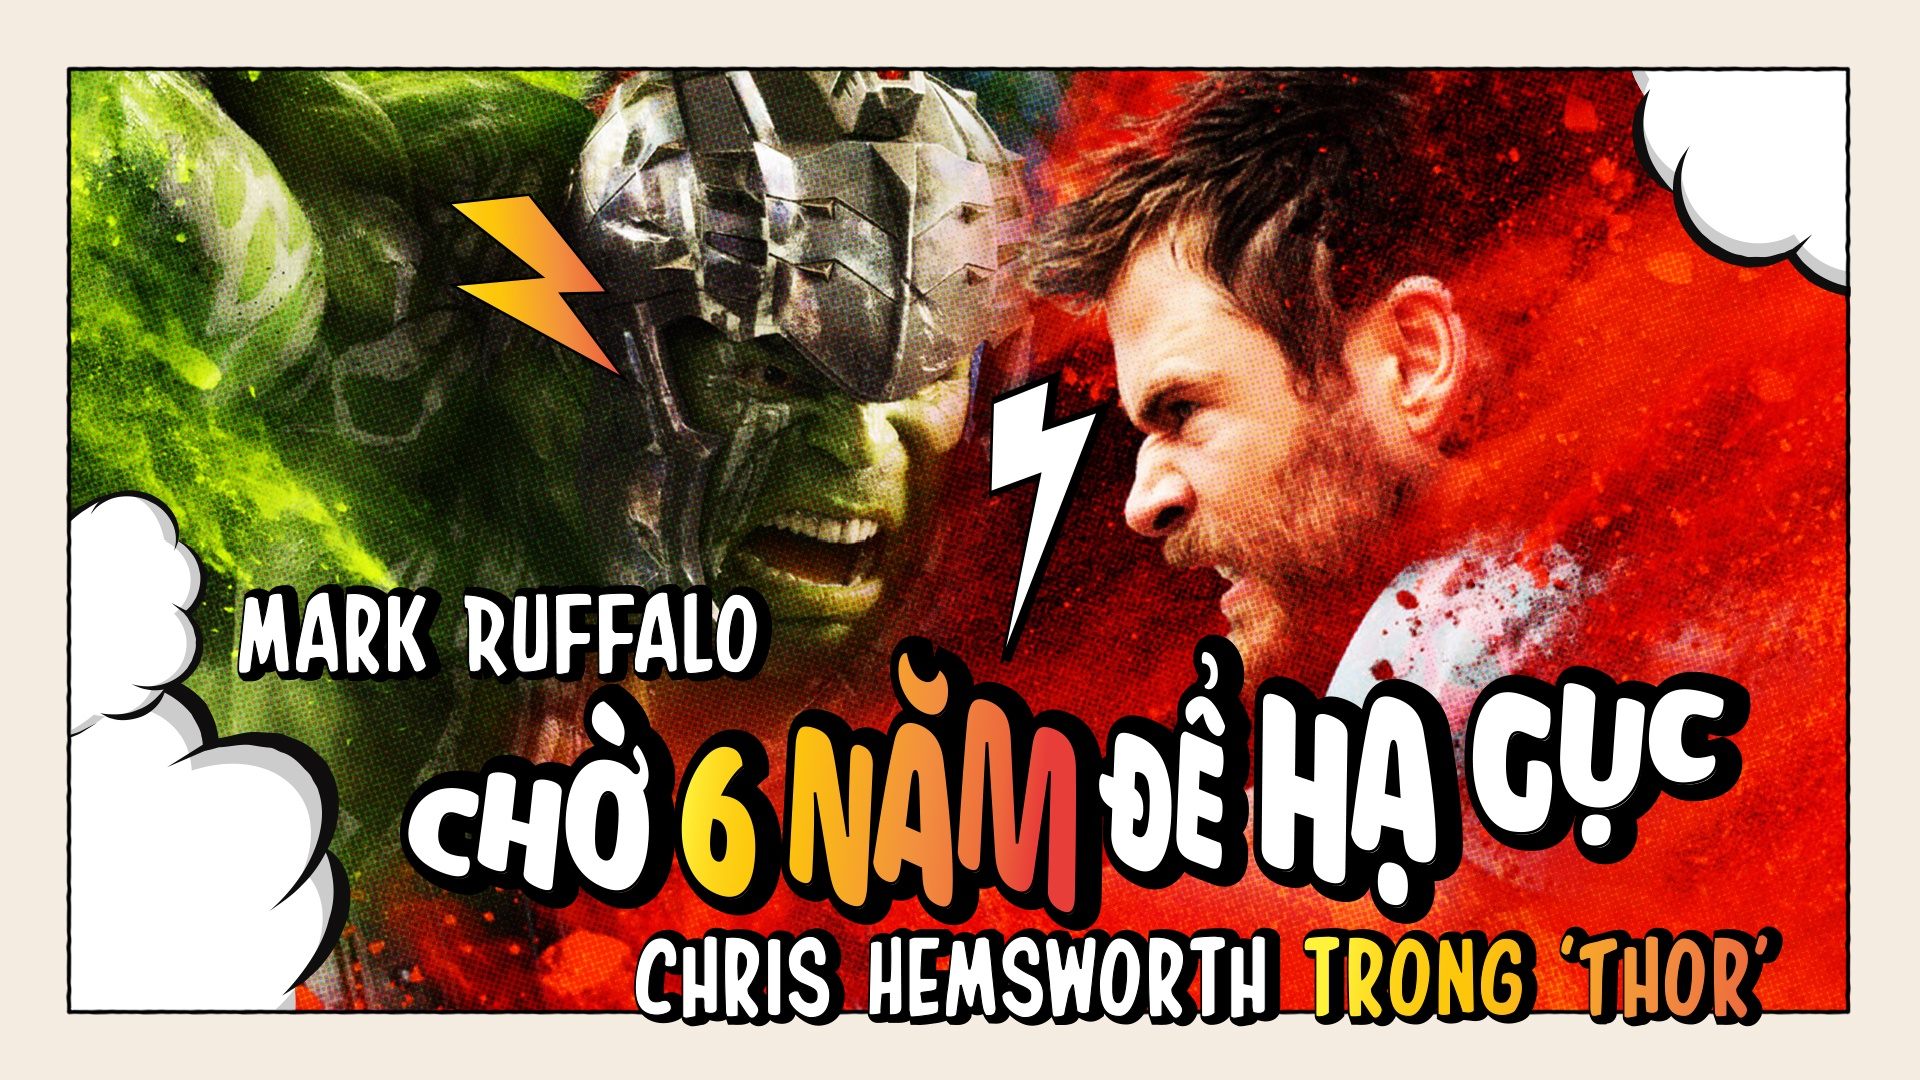 Mark Ruffalo cho 6 nam de ha guc Chris Hemsworth trong 'Thor' hinh anh 2